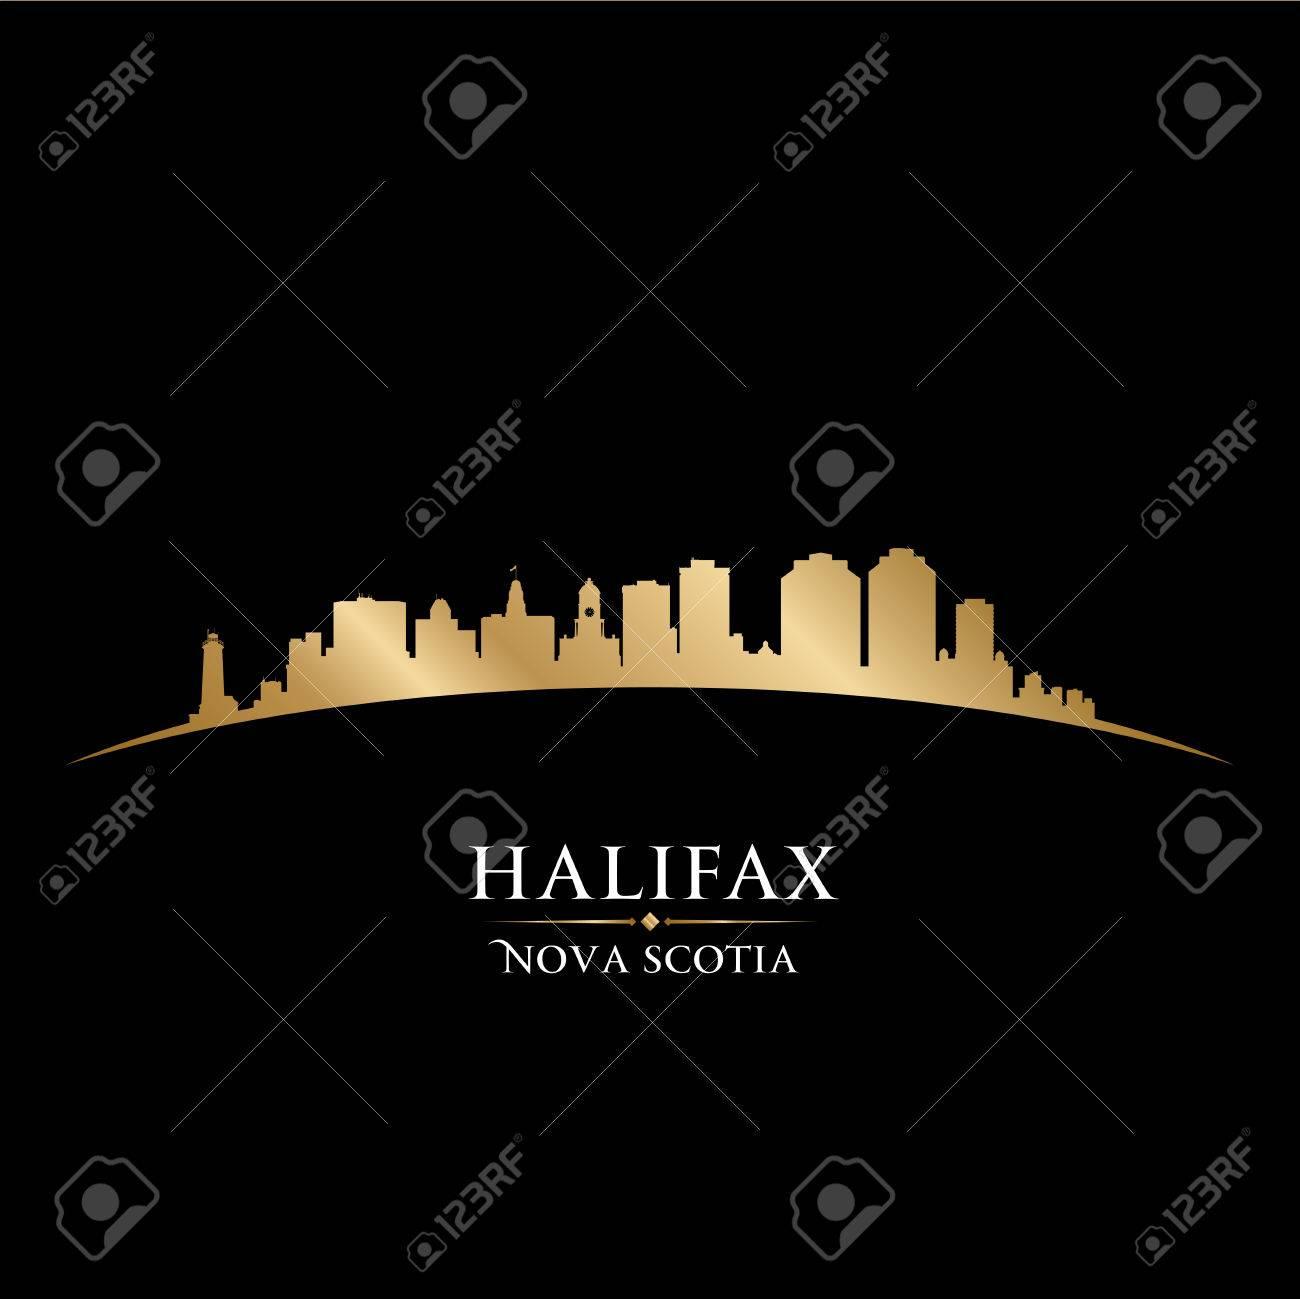 Halifax Nova Scotia Canada city skyline silhouette. Vector illustration Stock Vector - 22867295